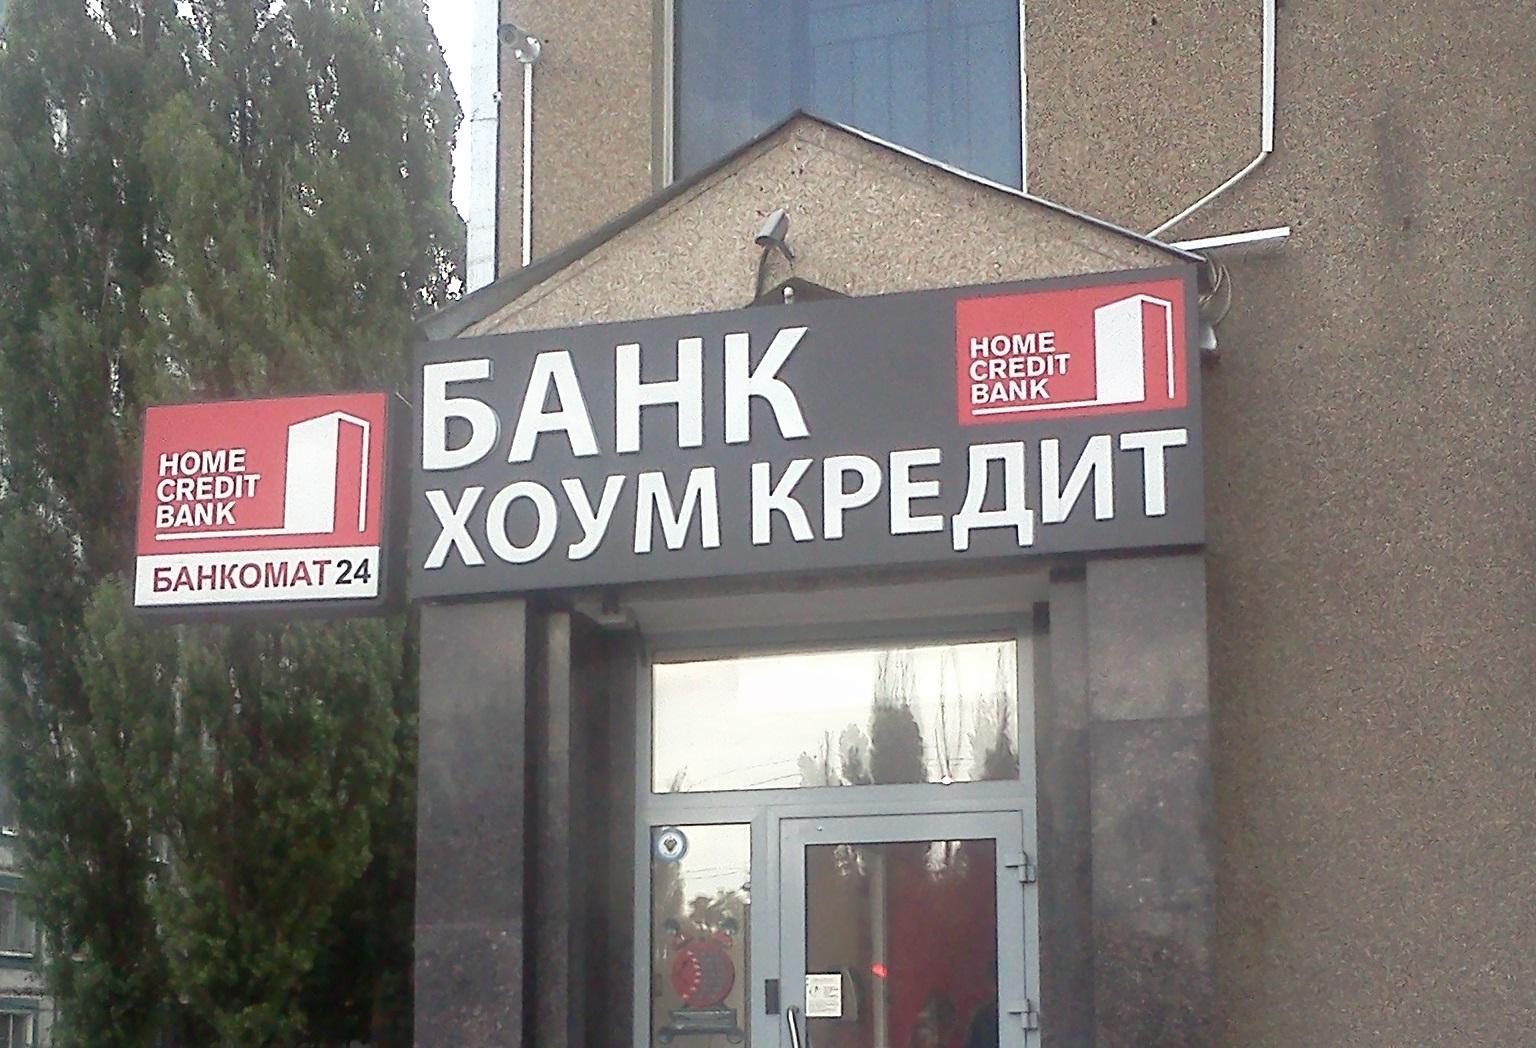 Банк хоум кредит в зеленограде